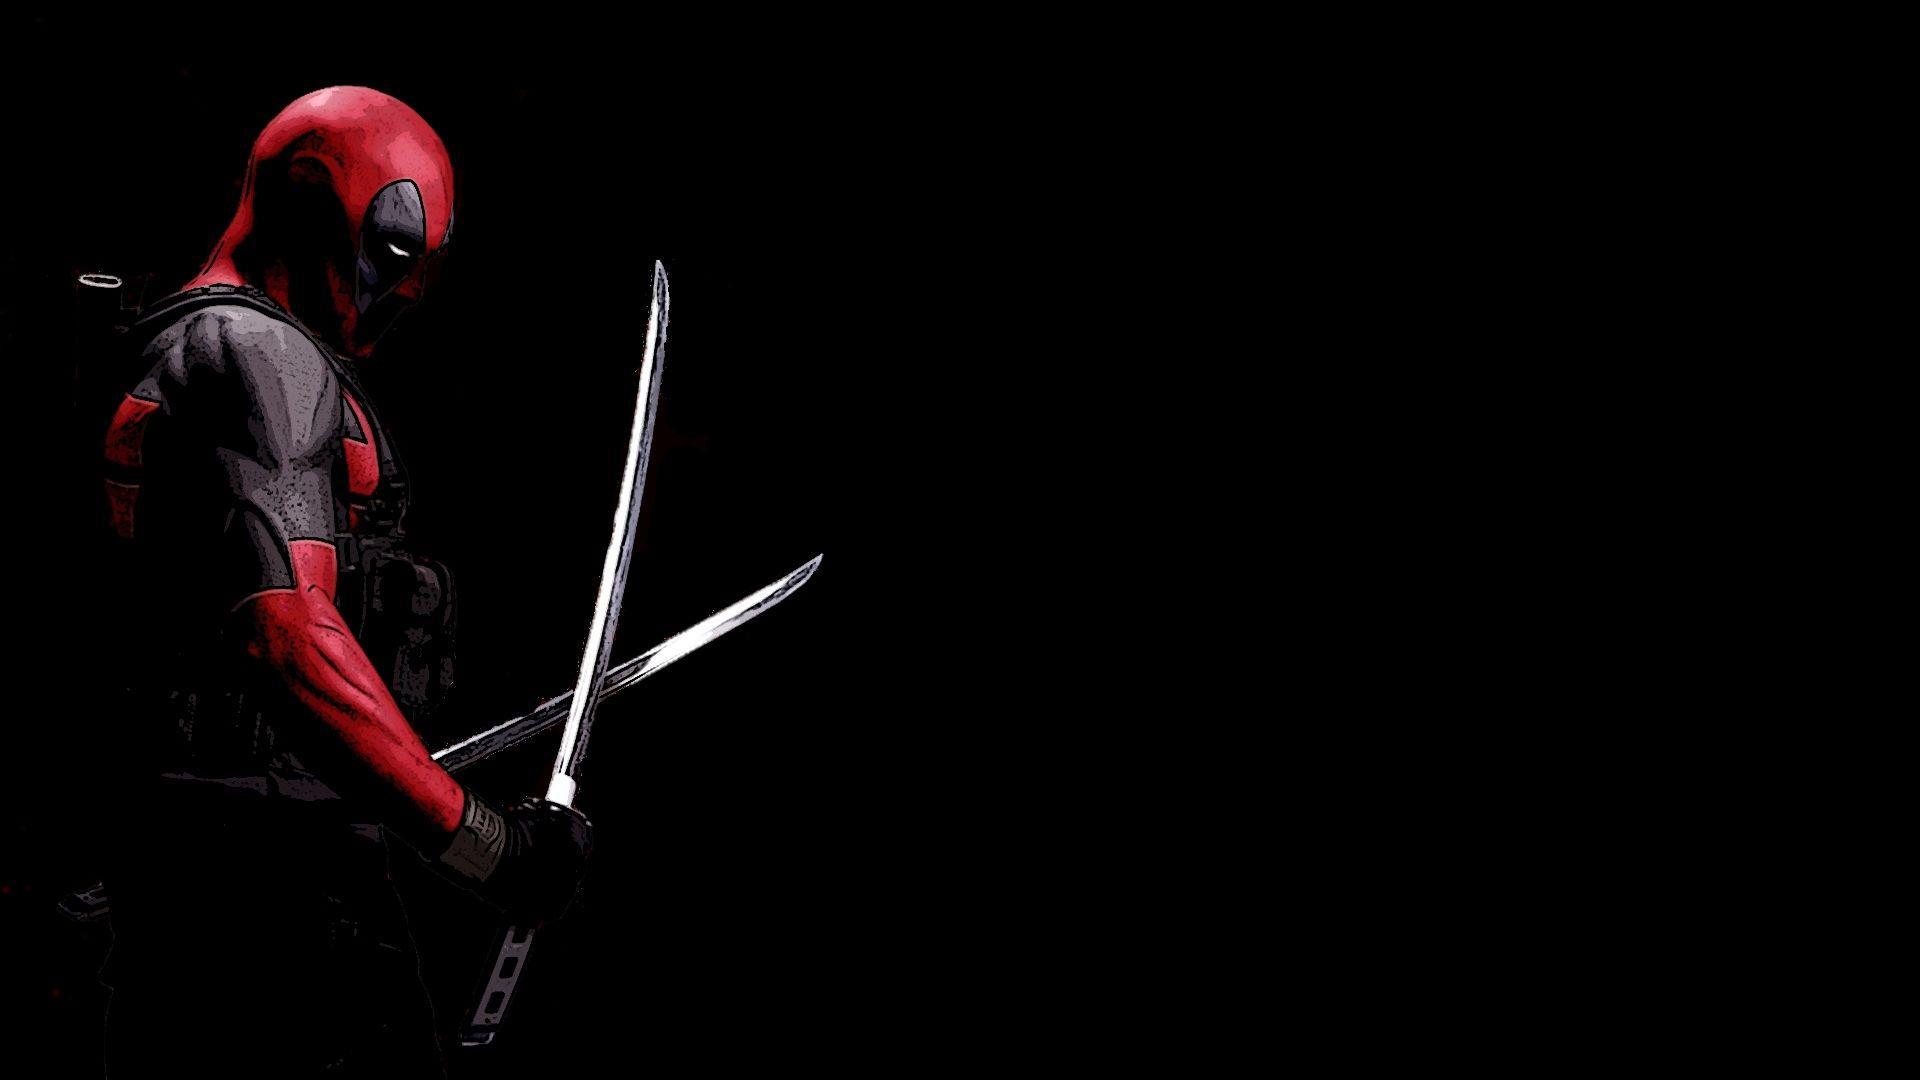 sword images